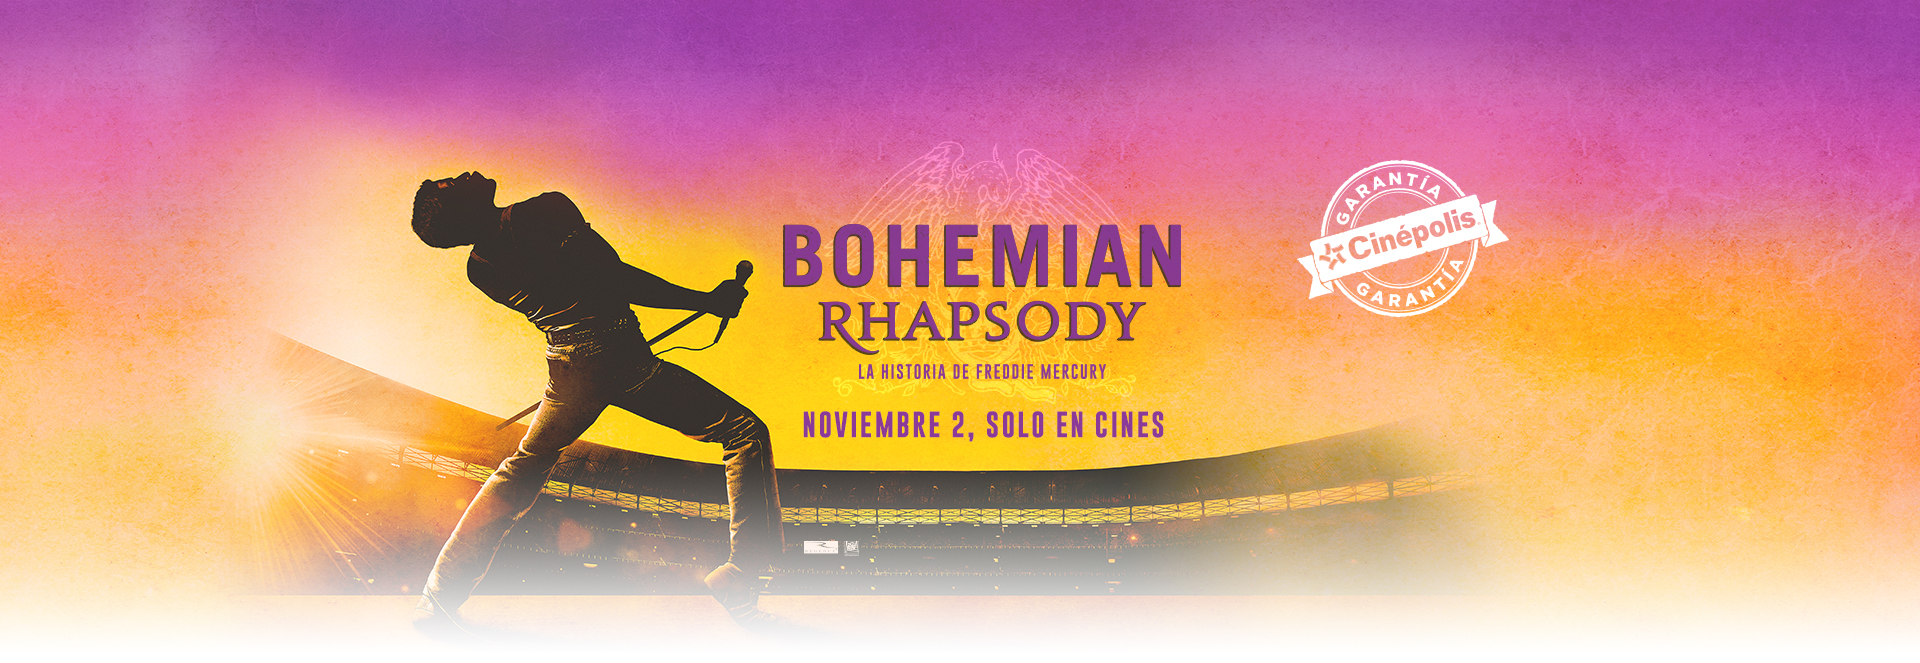 Banner Bohemian Rhapsody, La Historia de Freddie Mercury | Garantía Cinépolis